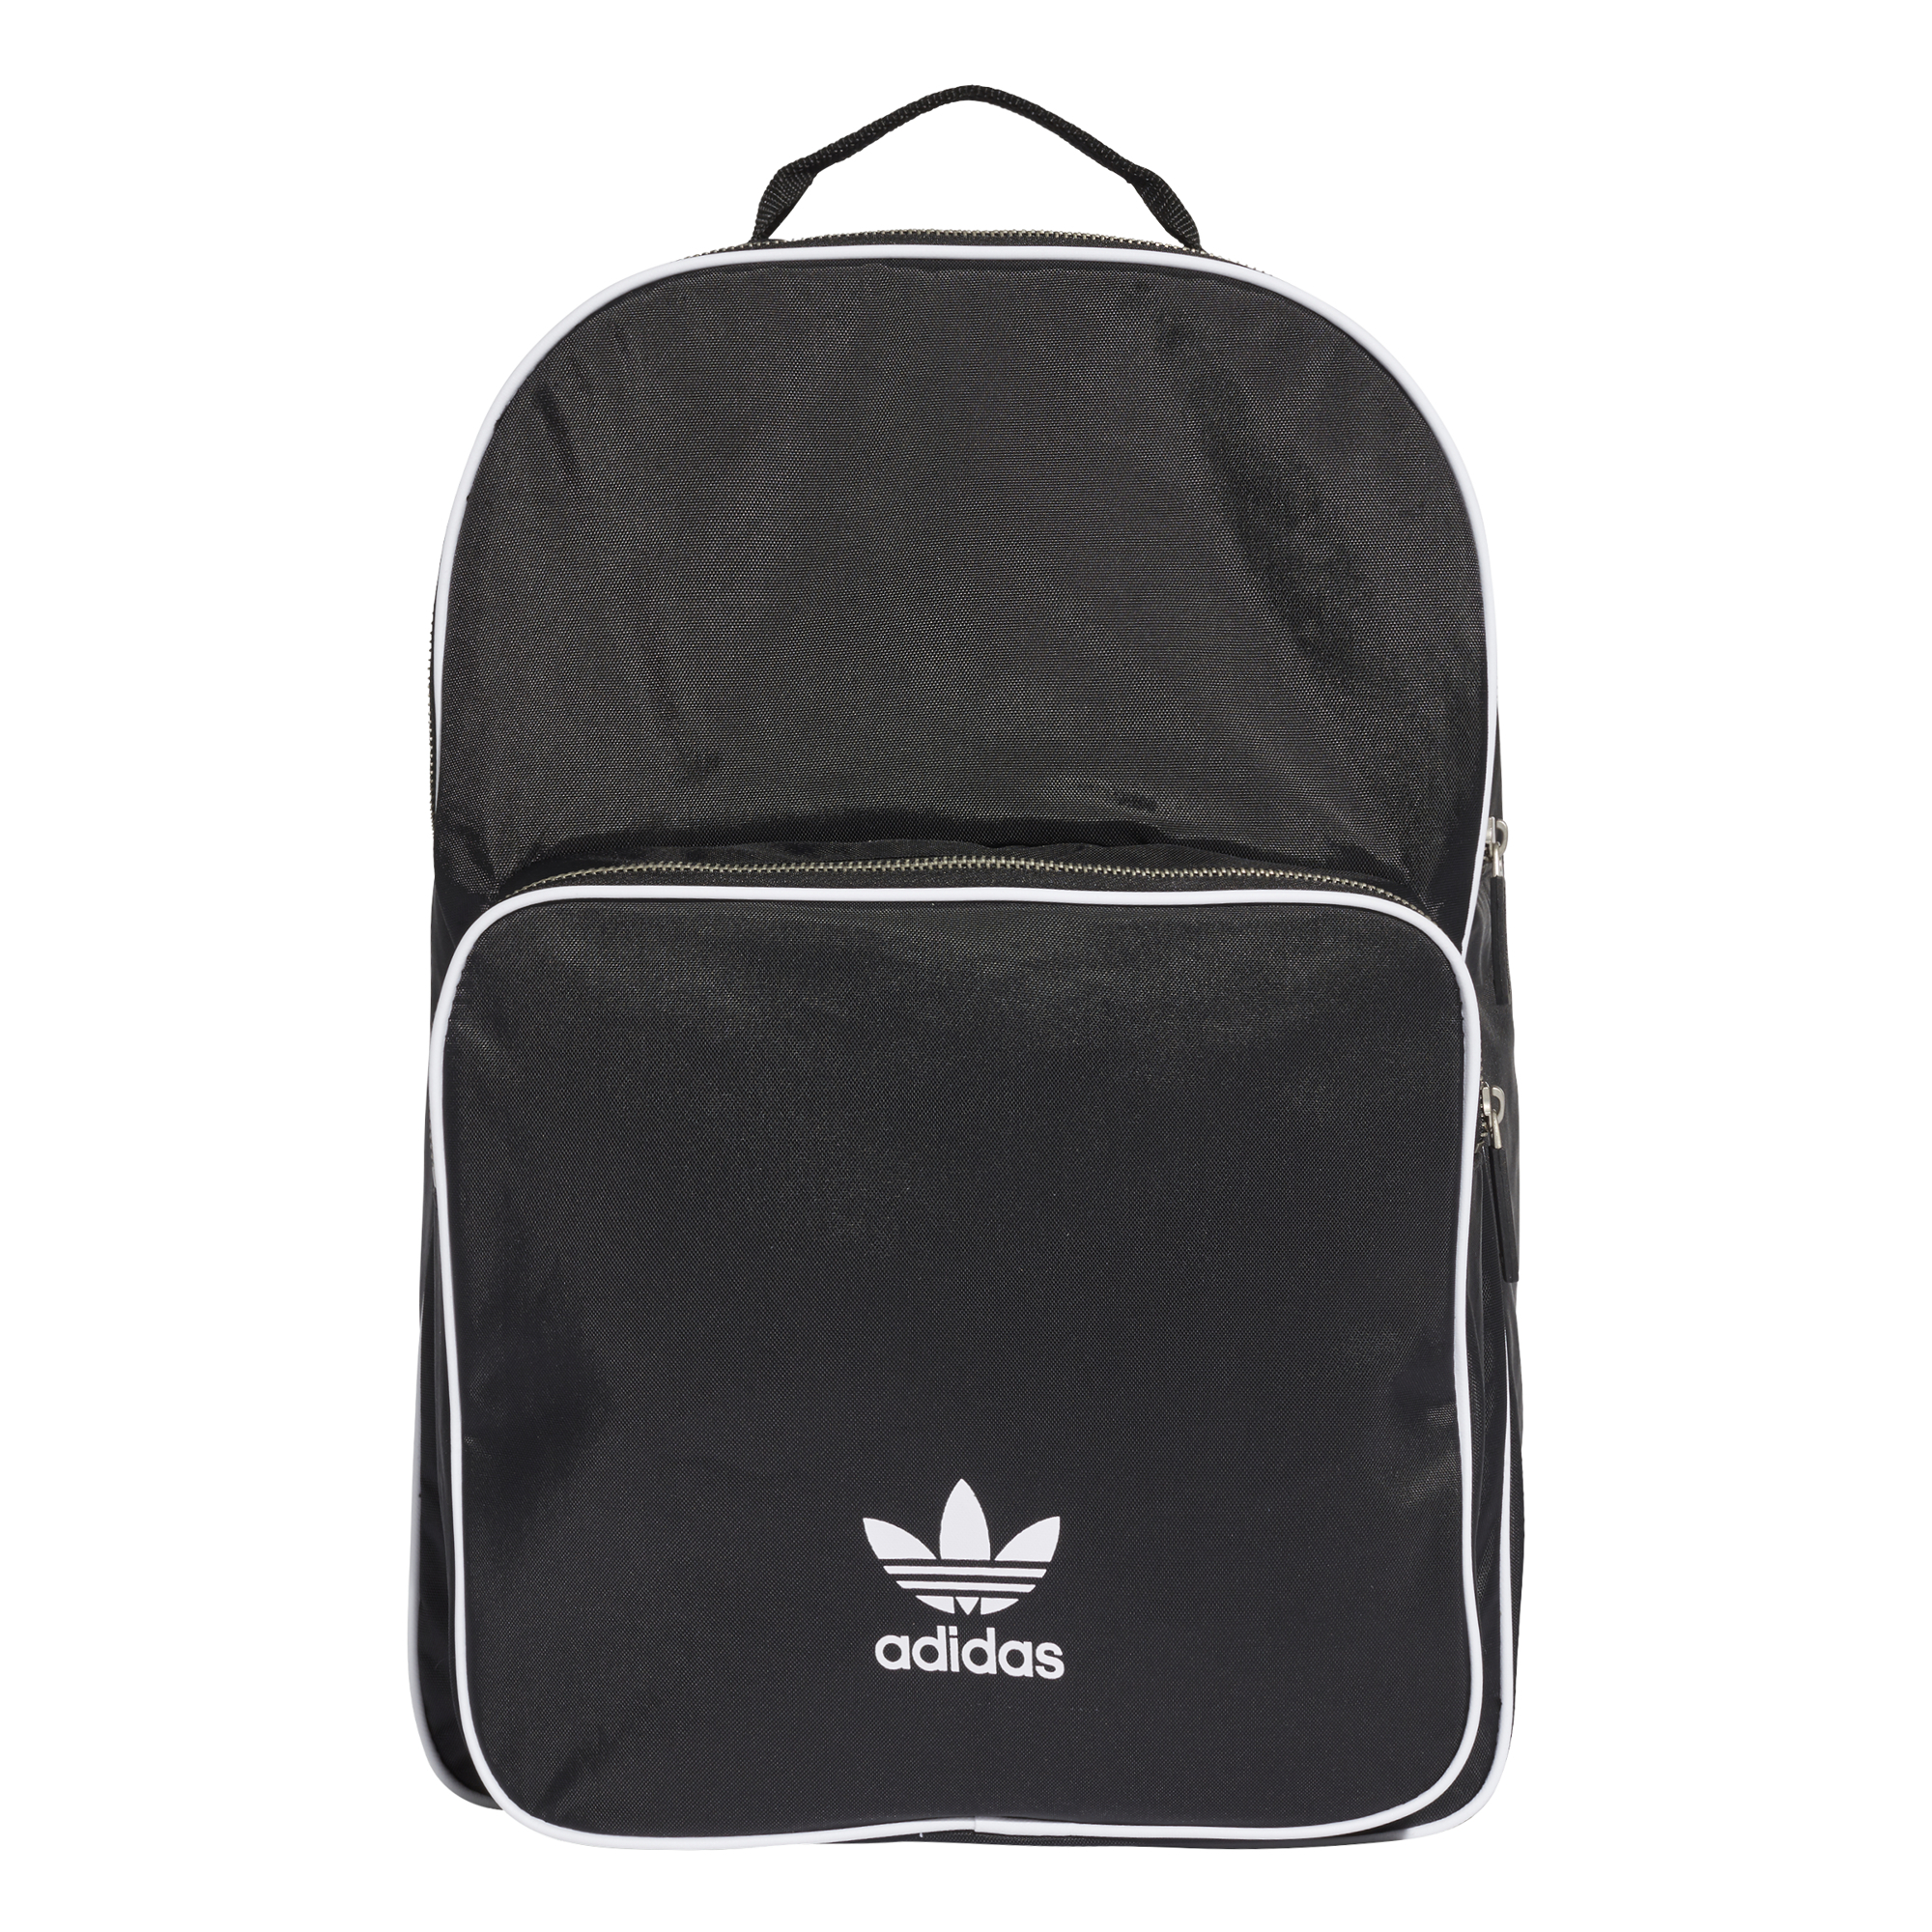 Adidas Adicolor Classic Backpack Black - Boardvillage a920e792b2